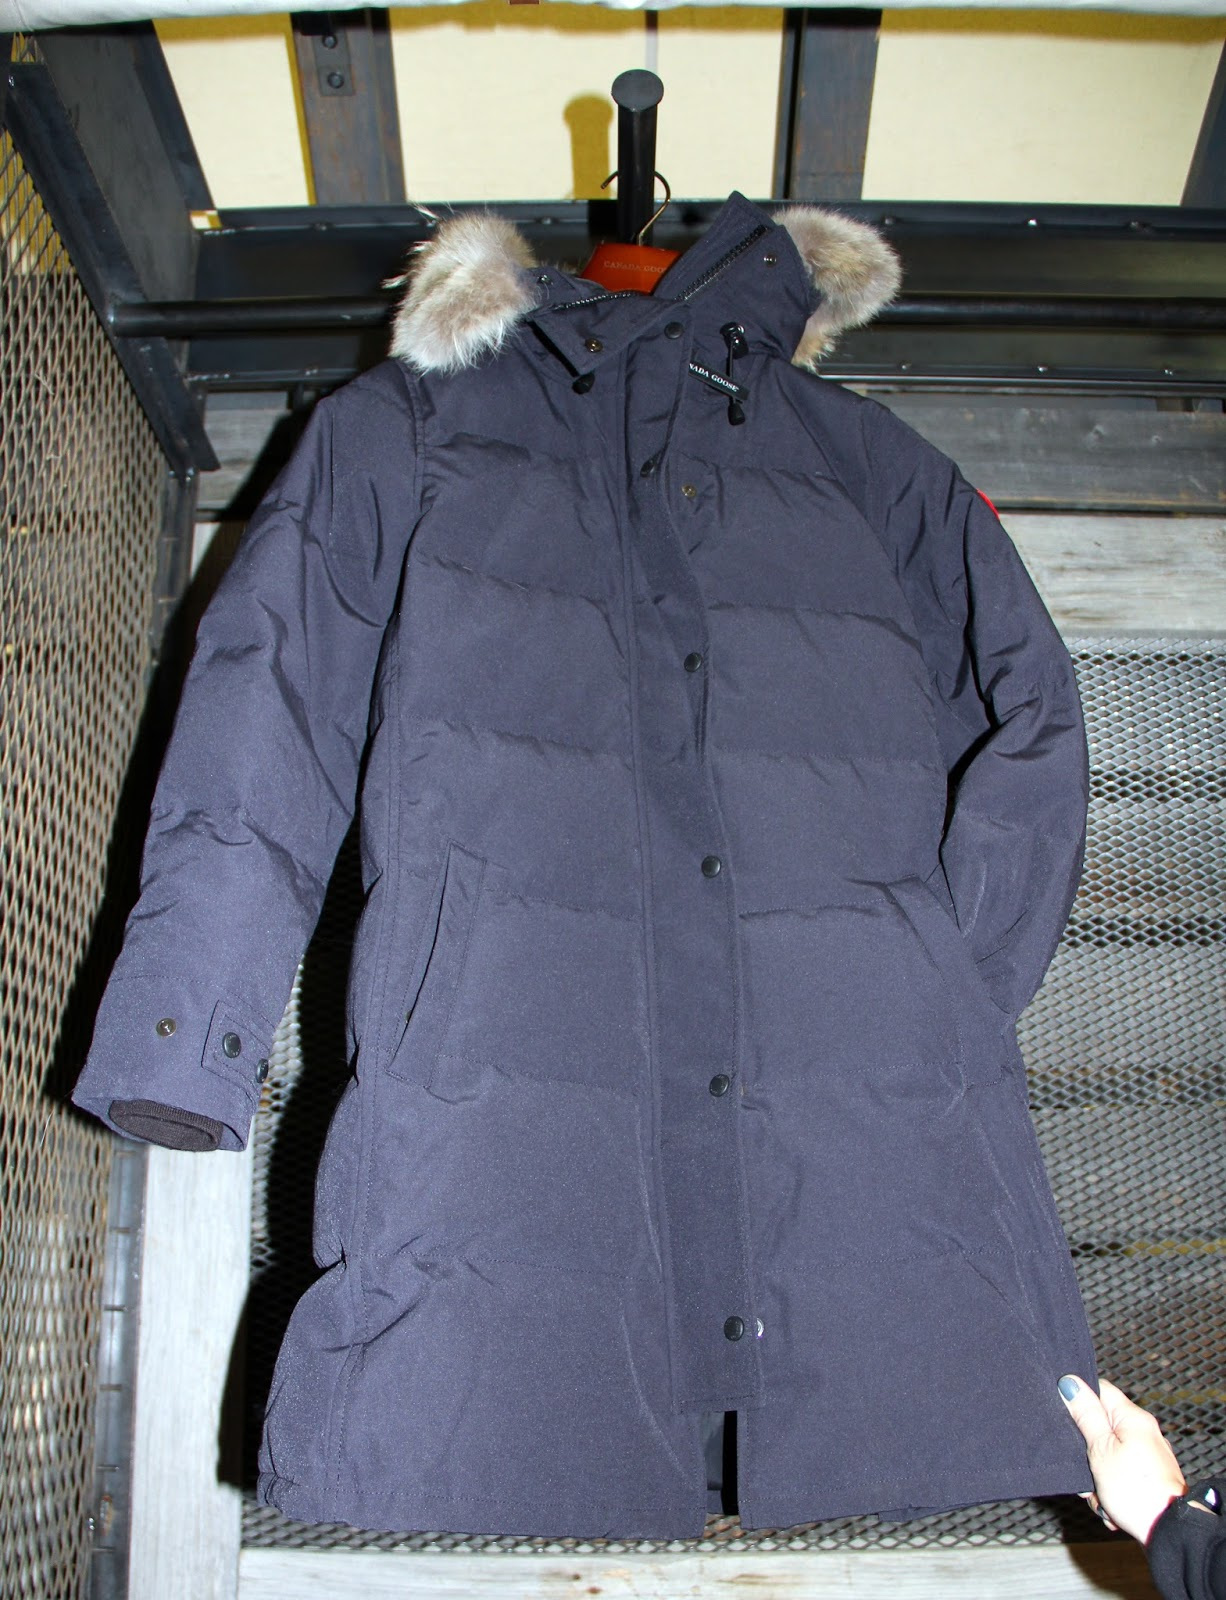 Canada Goose trillium parka sale cheap - LYRA MAG.: July 2014